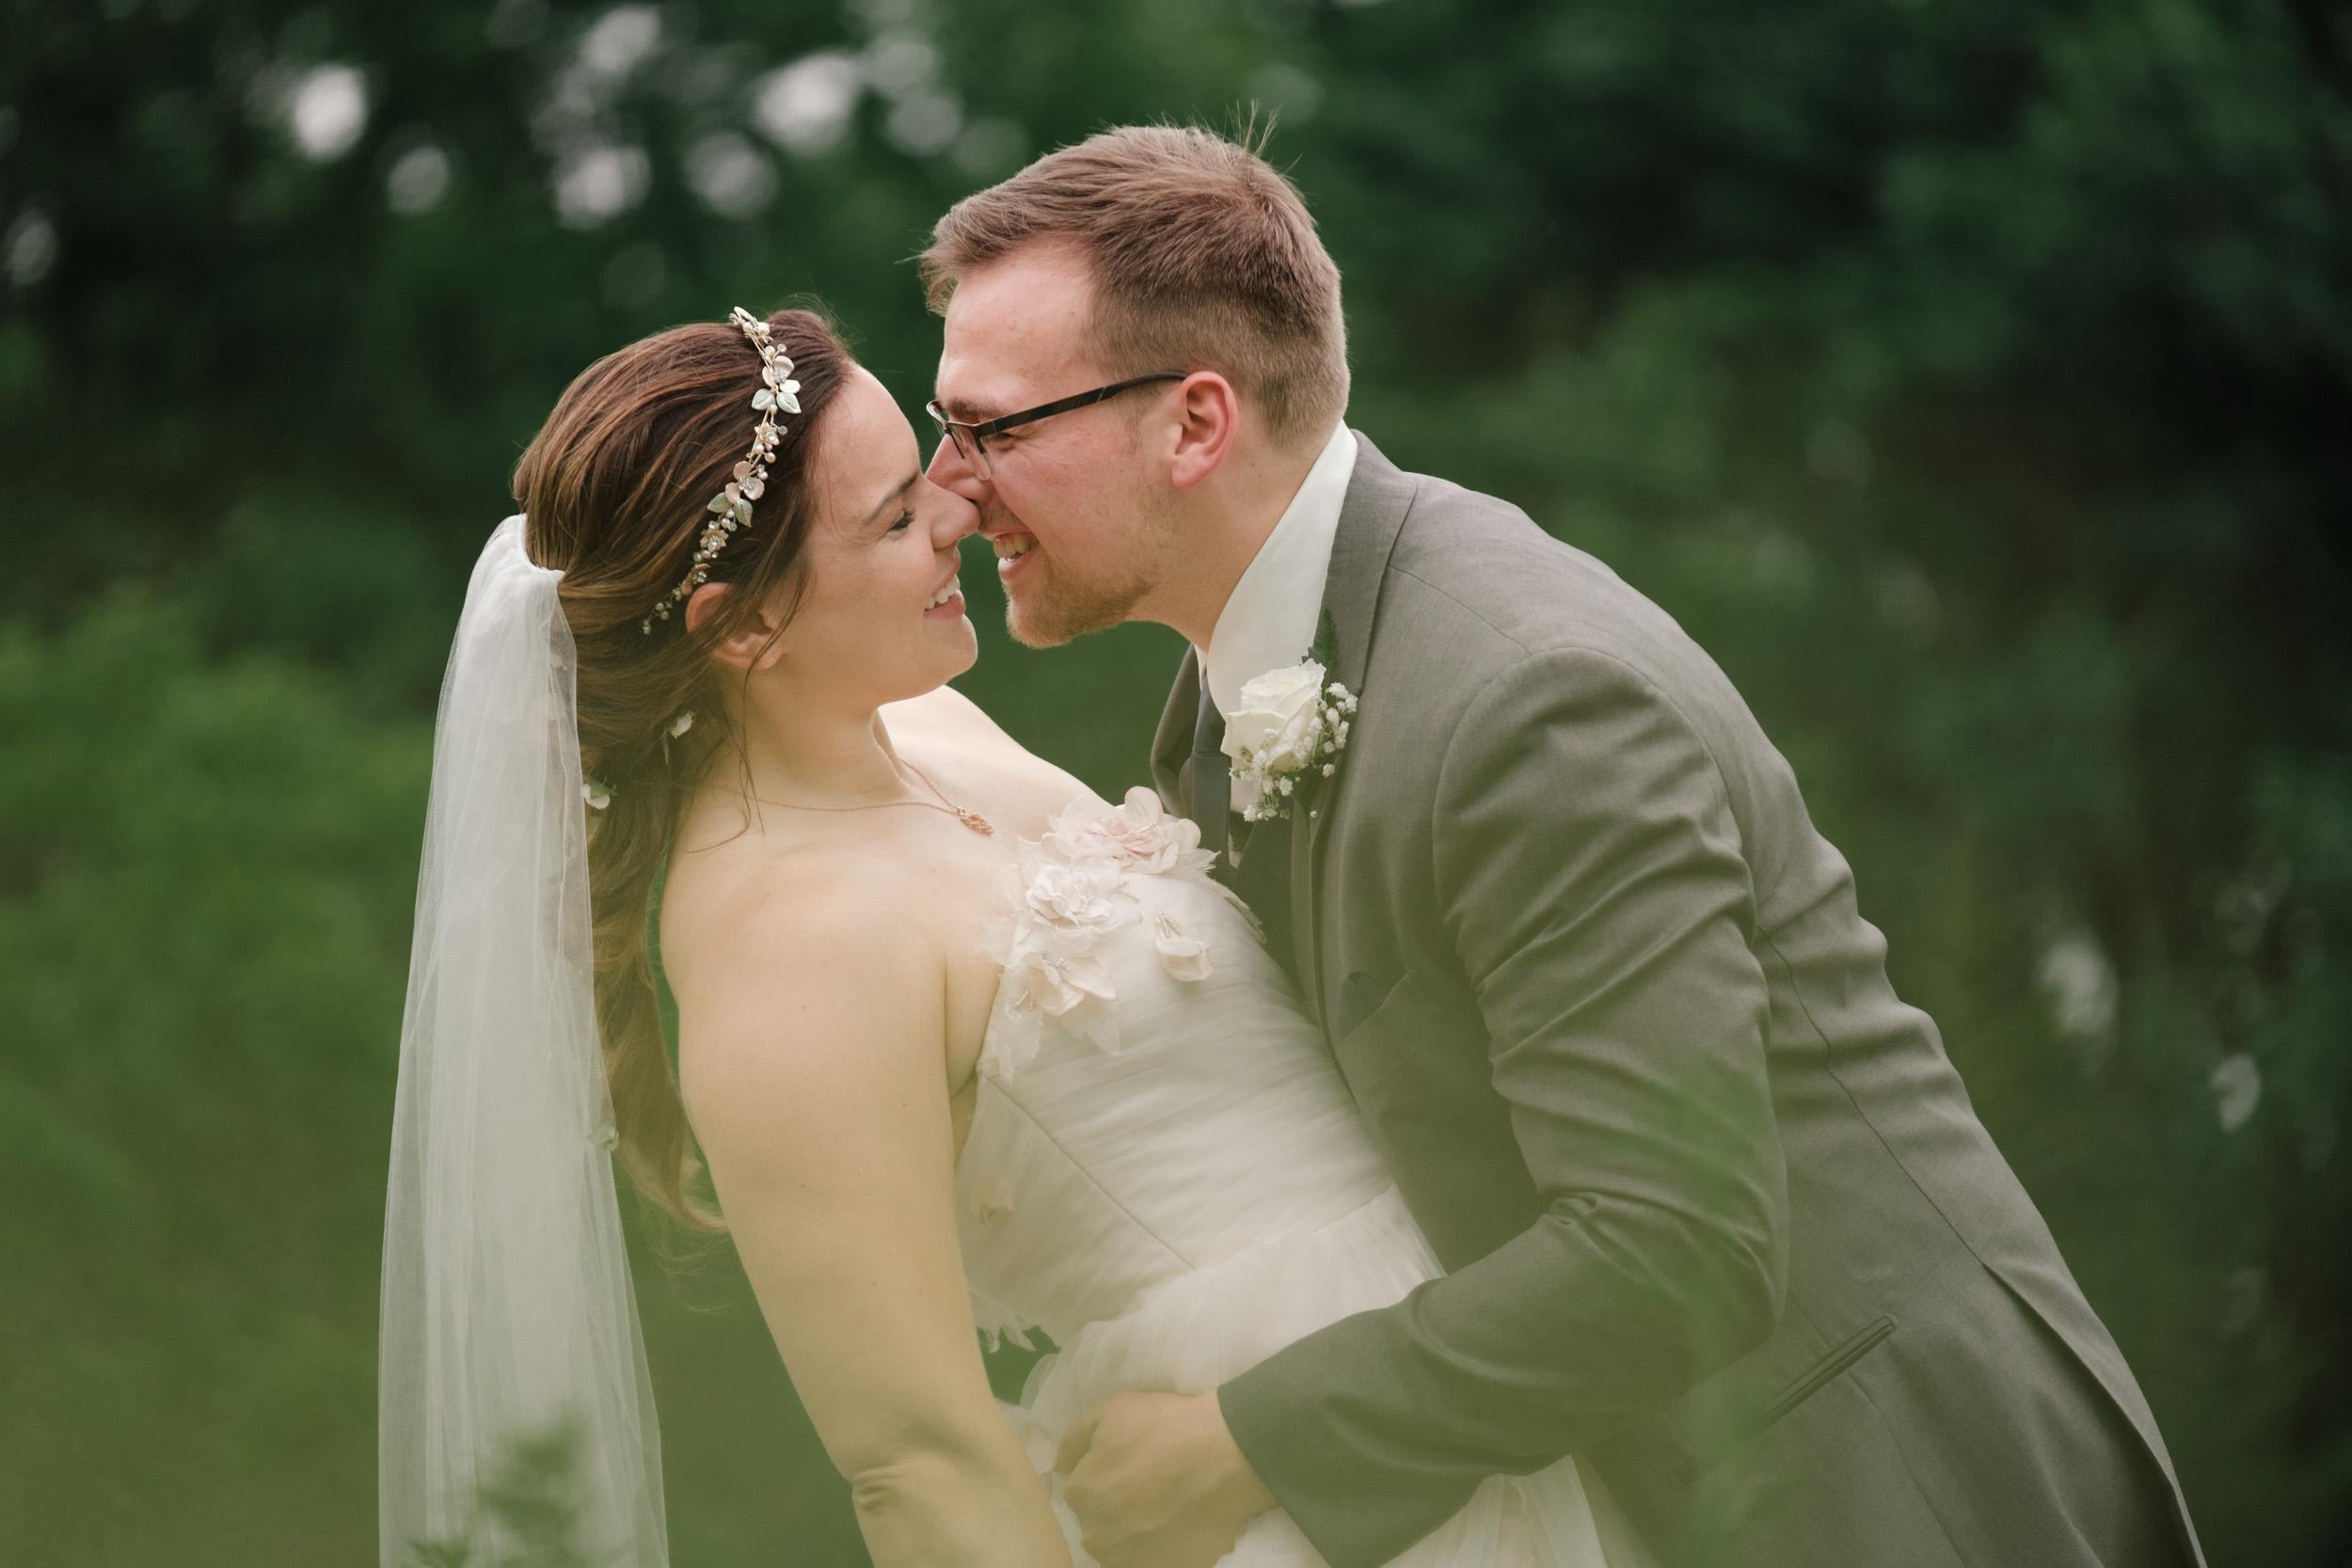 19-06-22-Ryan-Katie-The-Fields-Reserve-Wedding-51.jpg